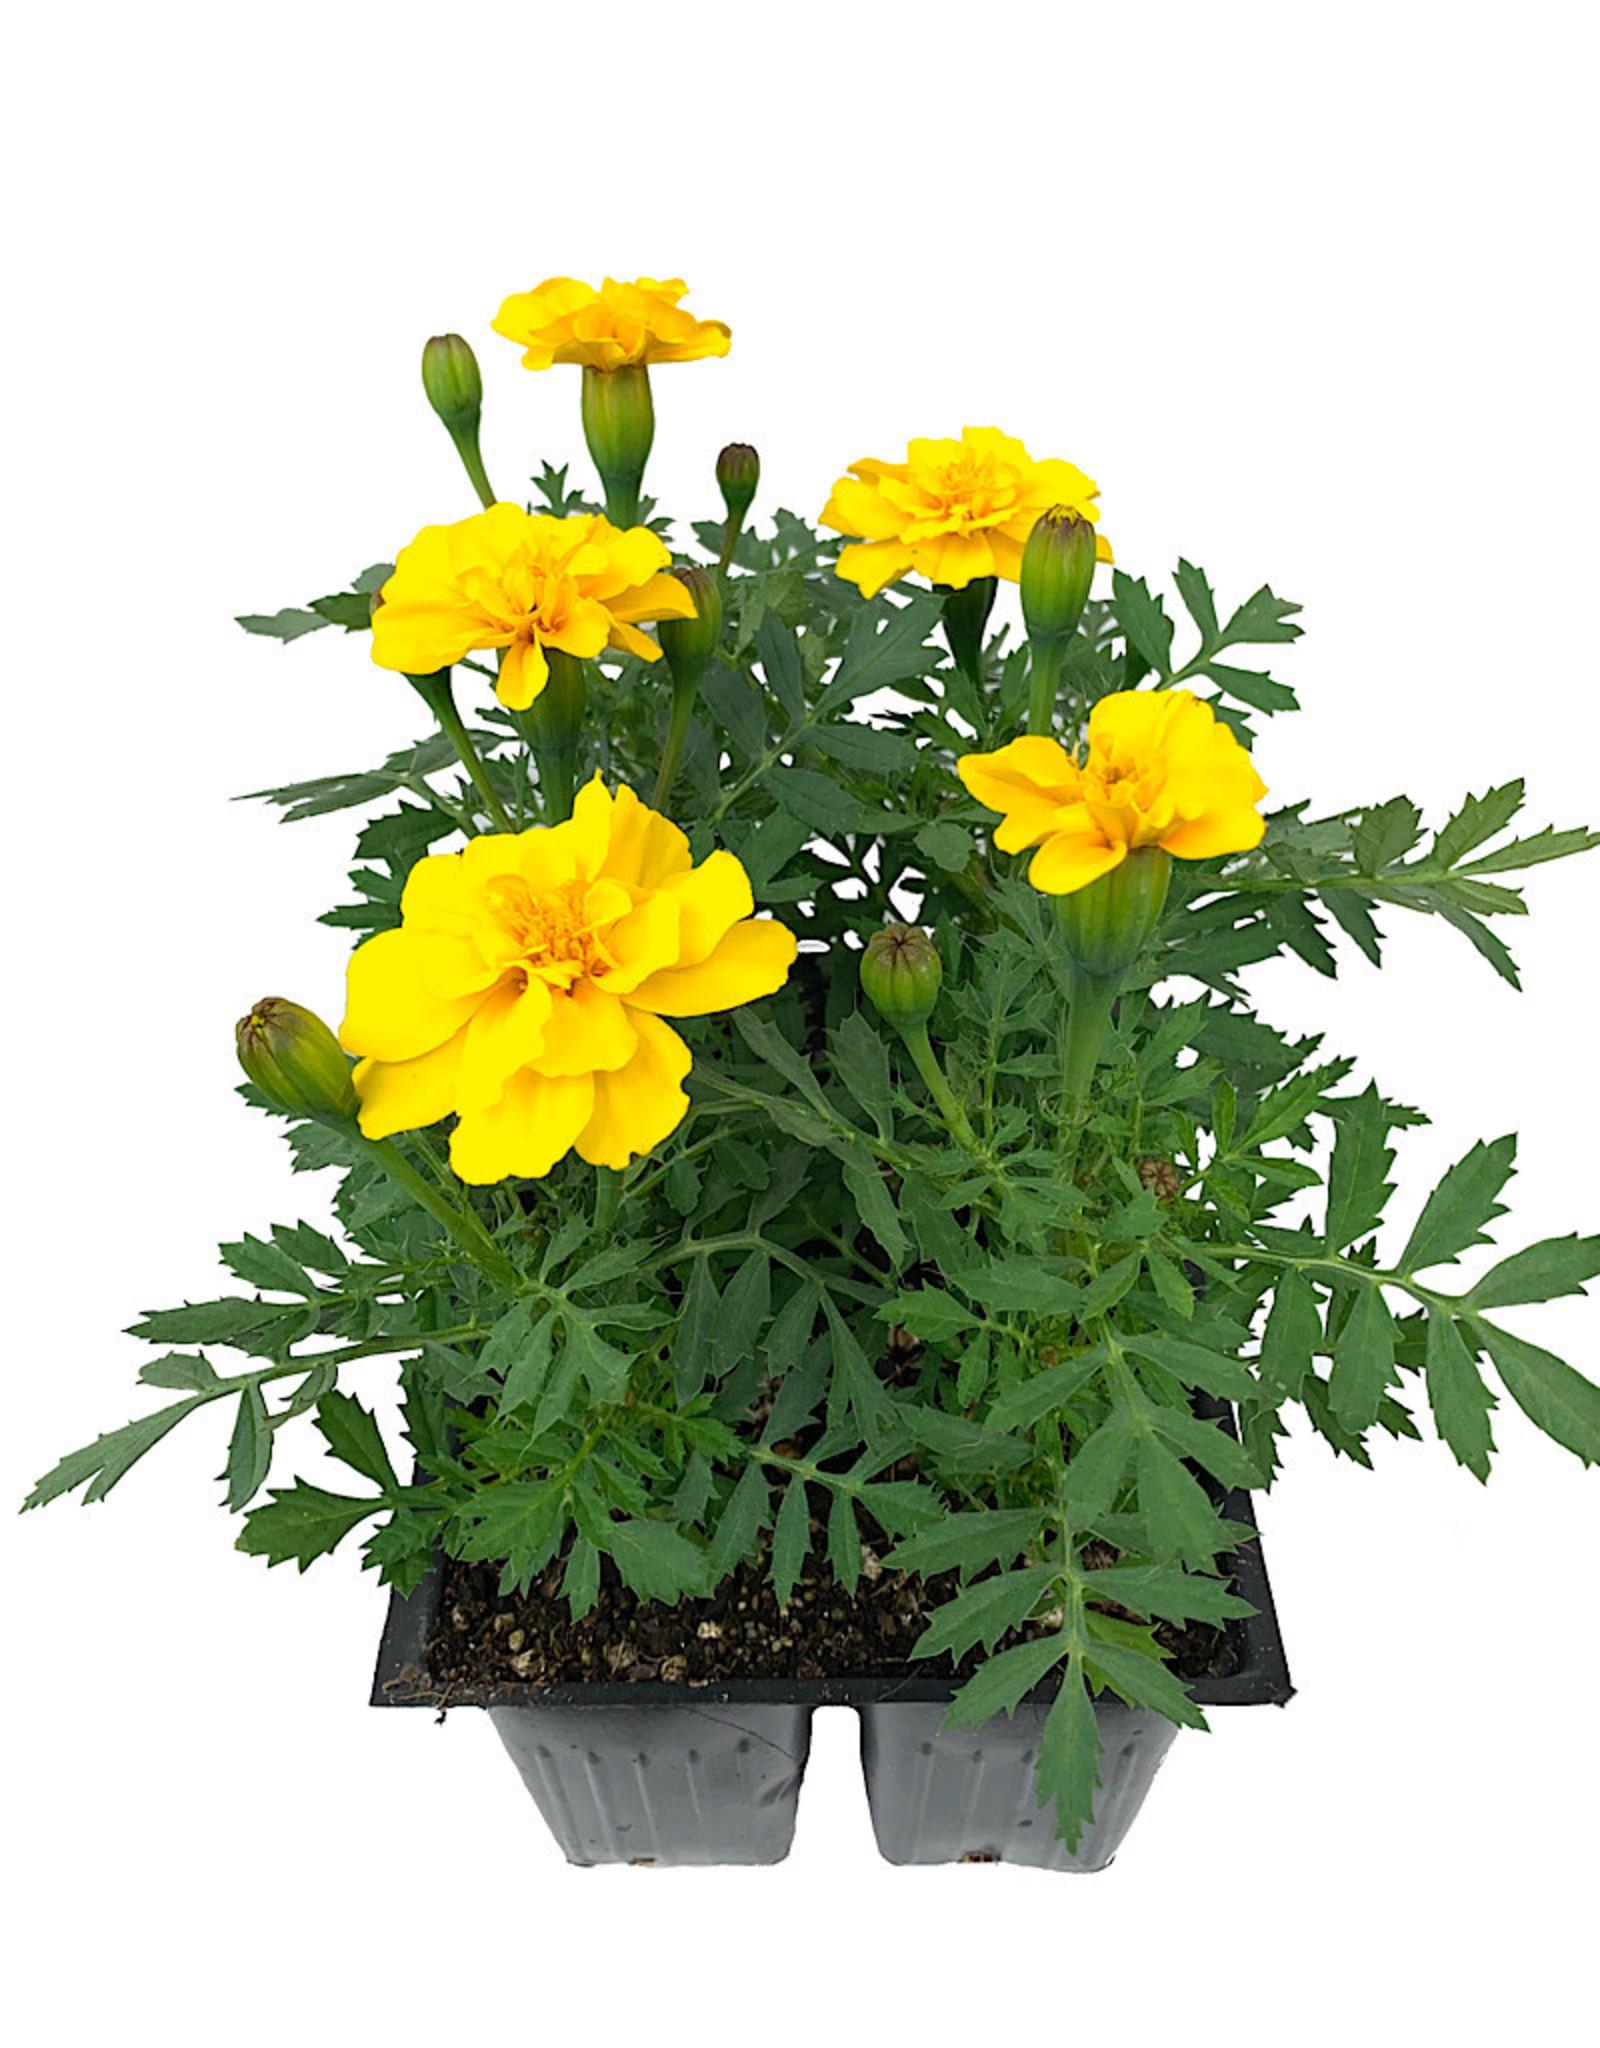 Marigold 'Safari Yellow' - Jumbo Traypack